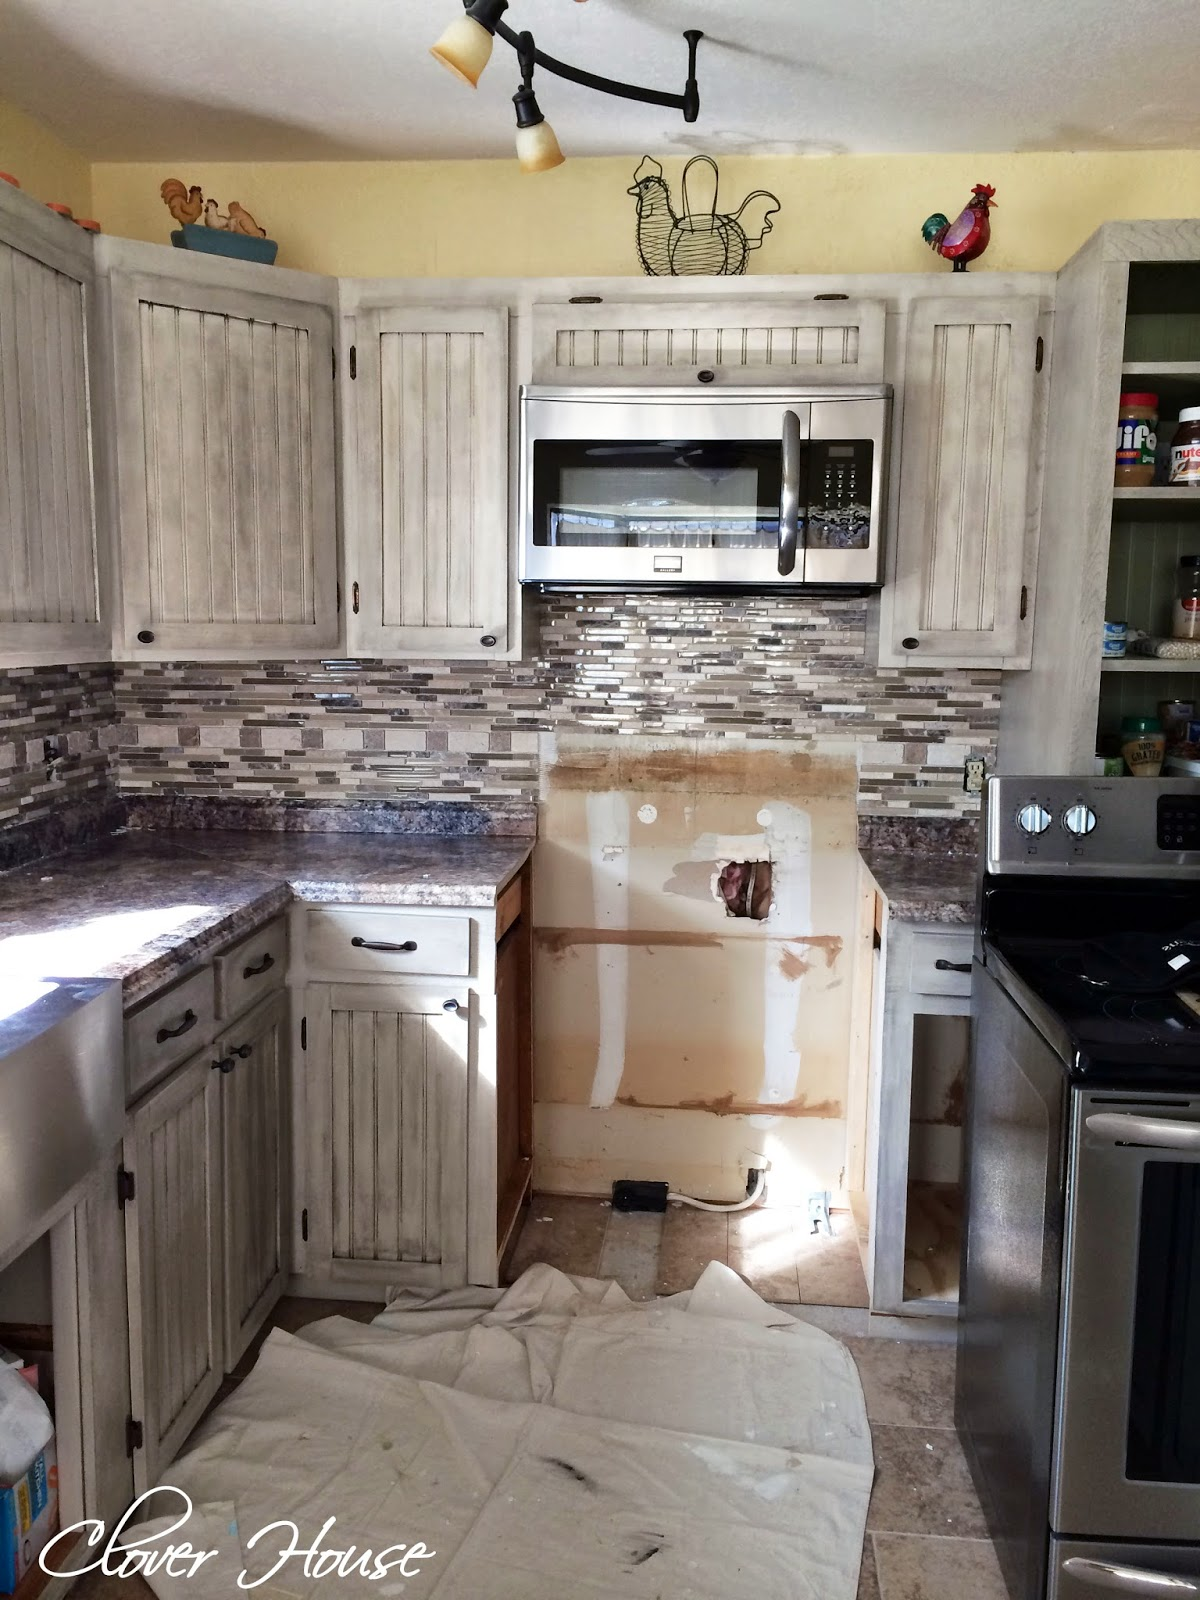 Clover House: DIY Mosaic Tile Backsplash